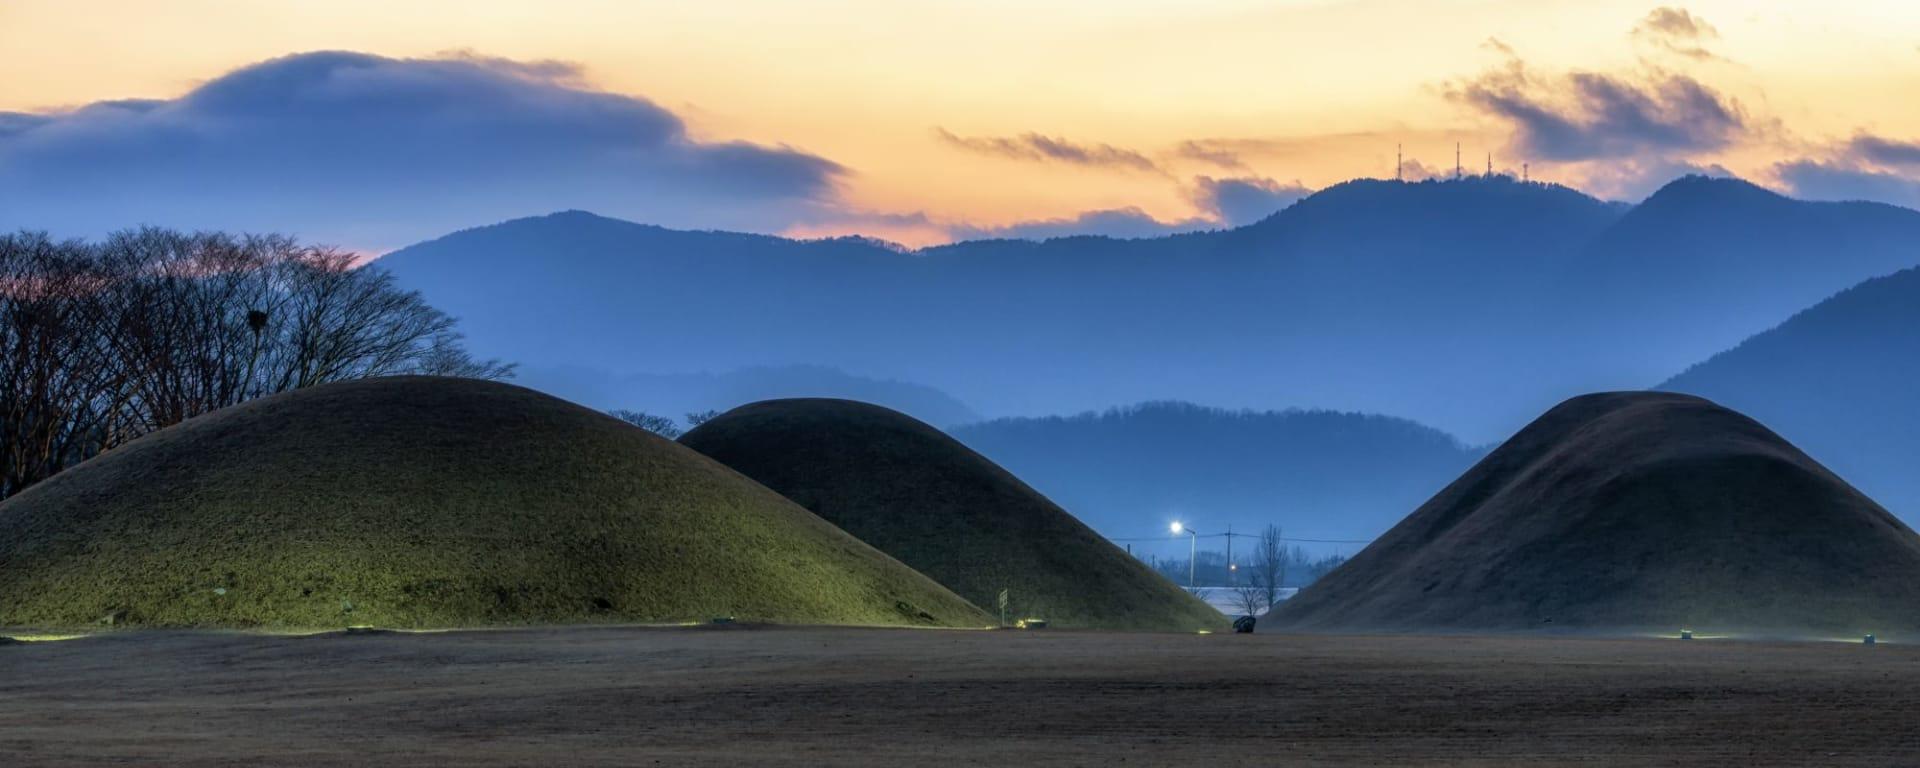 Südkorea Kompakt ab Seoul: Naemul of silla royal king mound in gyeongju